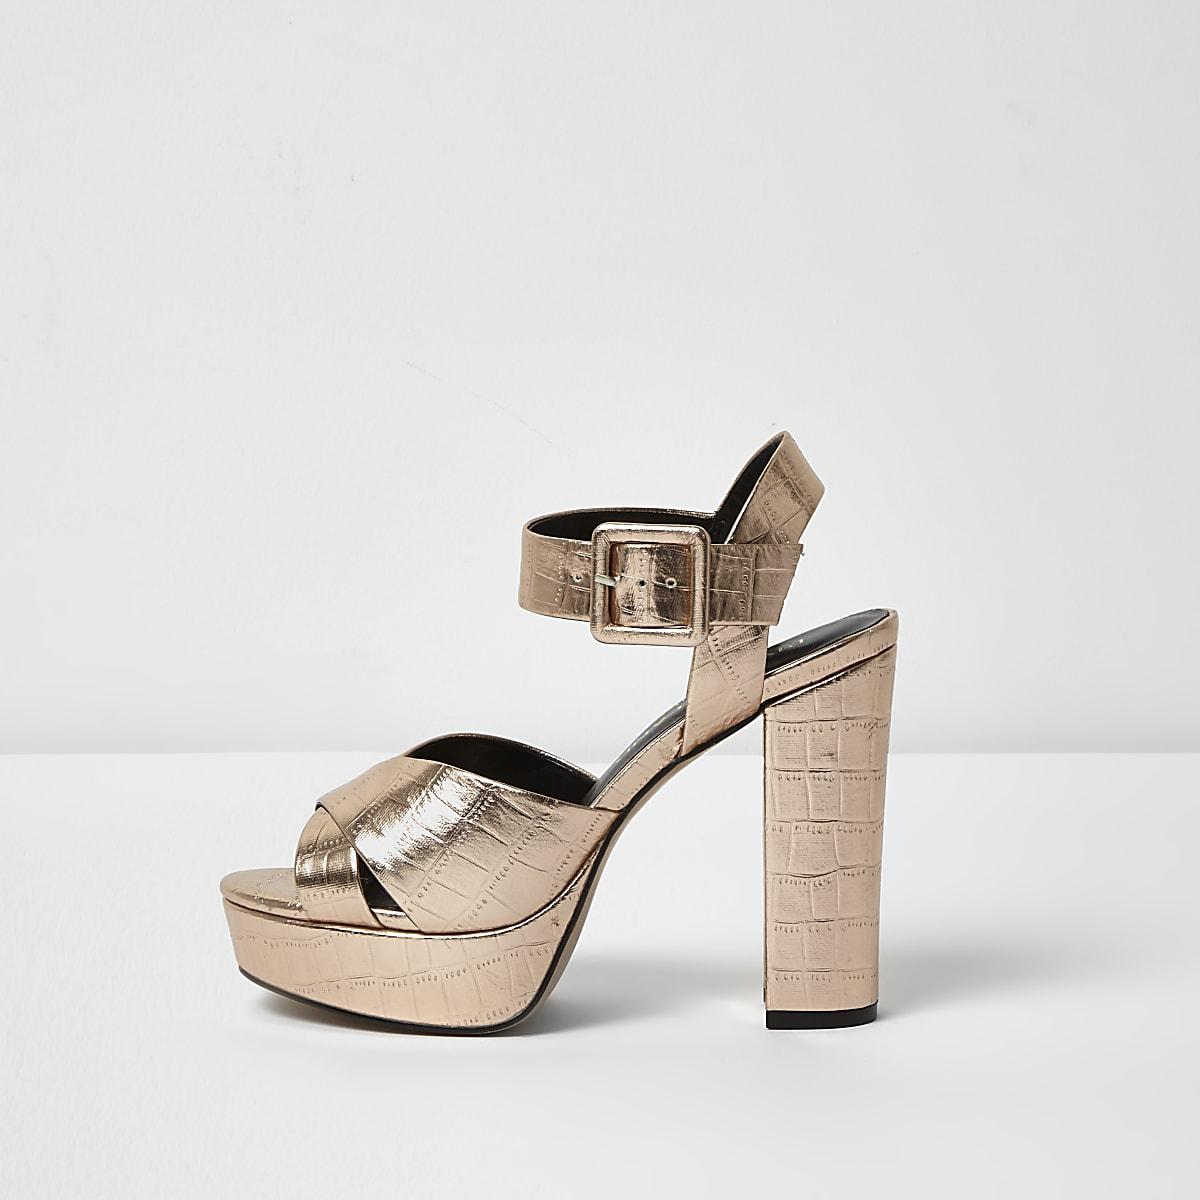 24040e787a00 Rose gold wide fit platform heel sandals - Sandals - Shoes   Boots - women